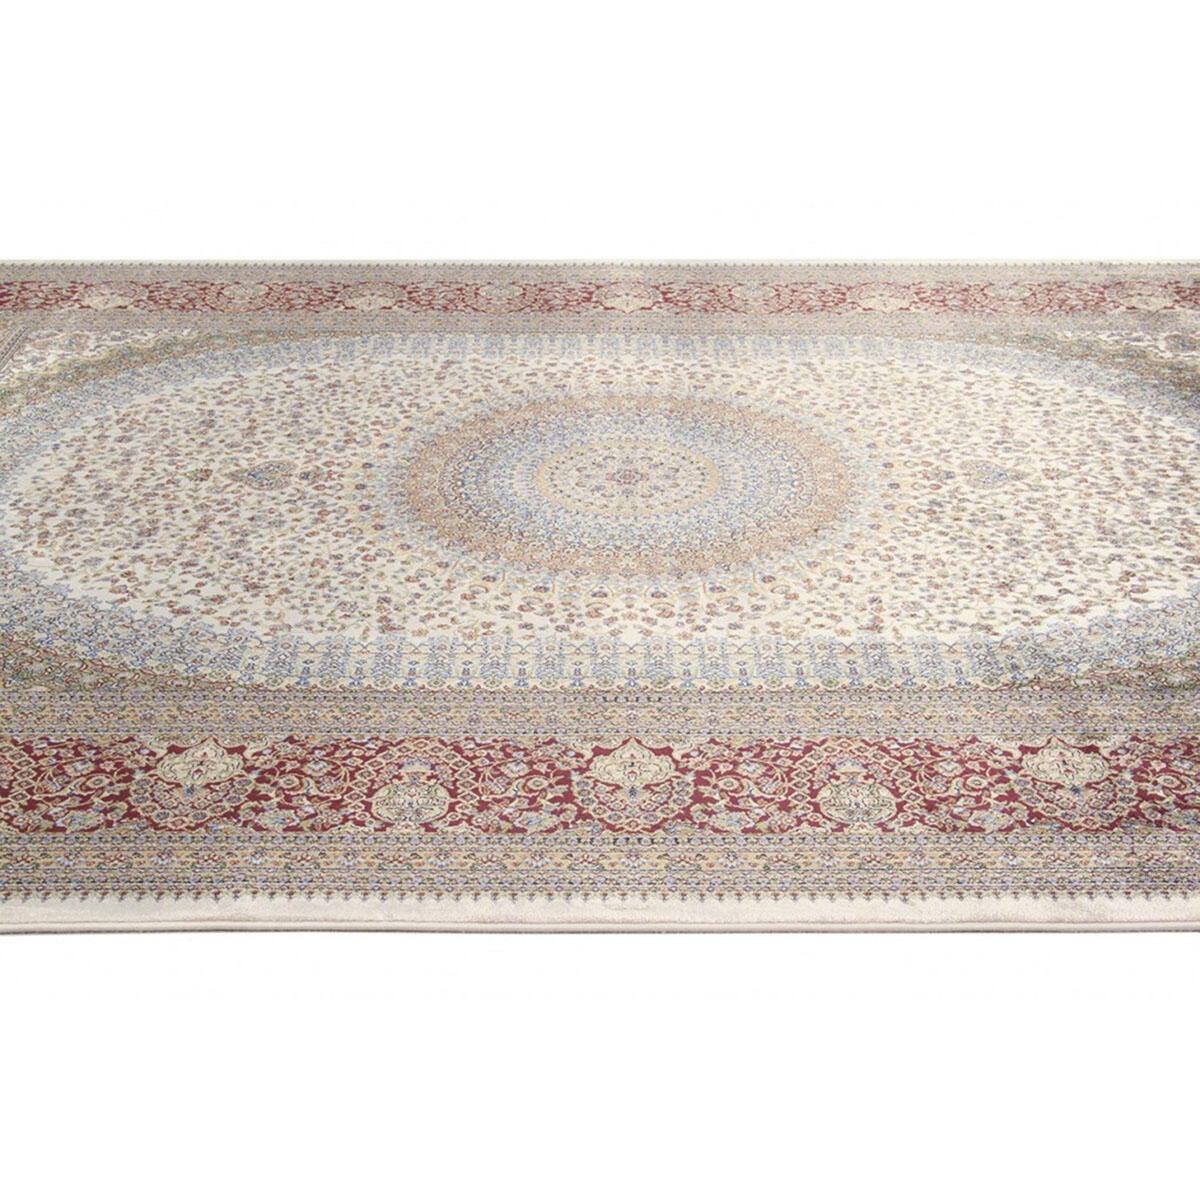 Tappeto Qoum Shah 5 in cotone, beige, 200x290 - 4